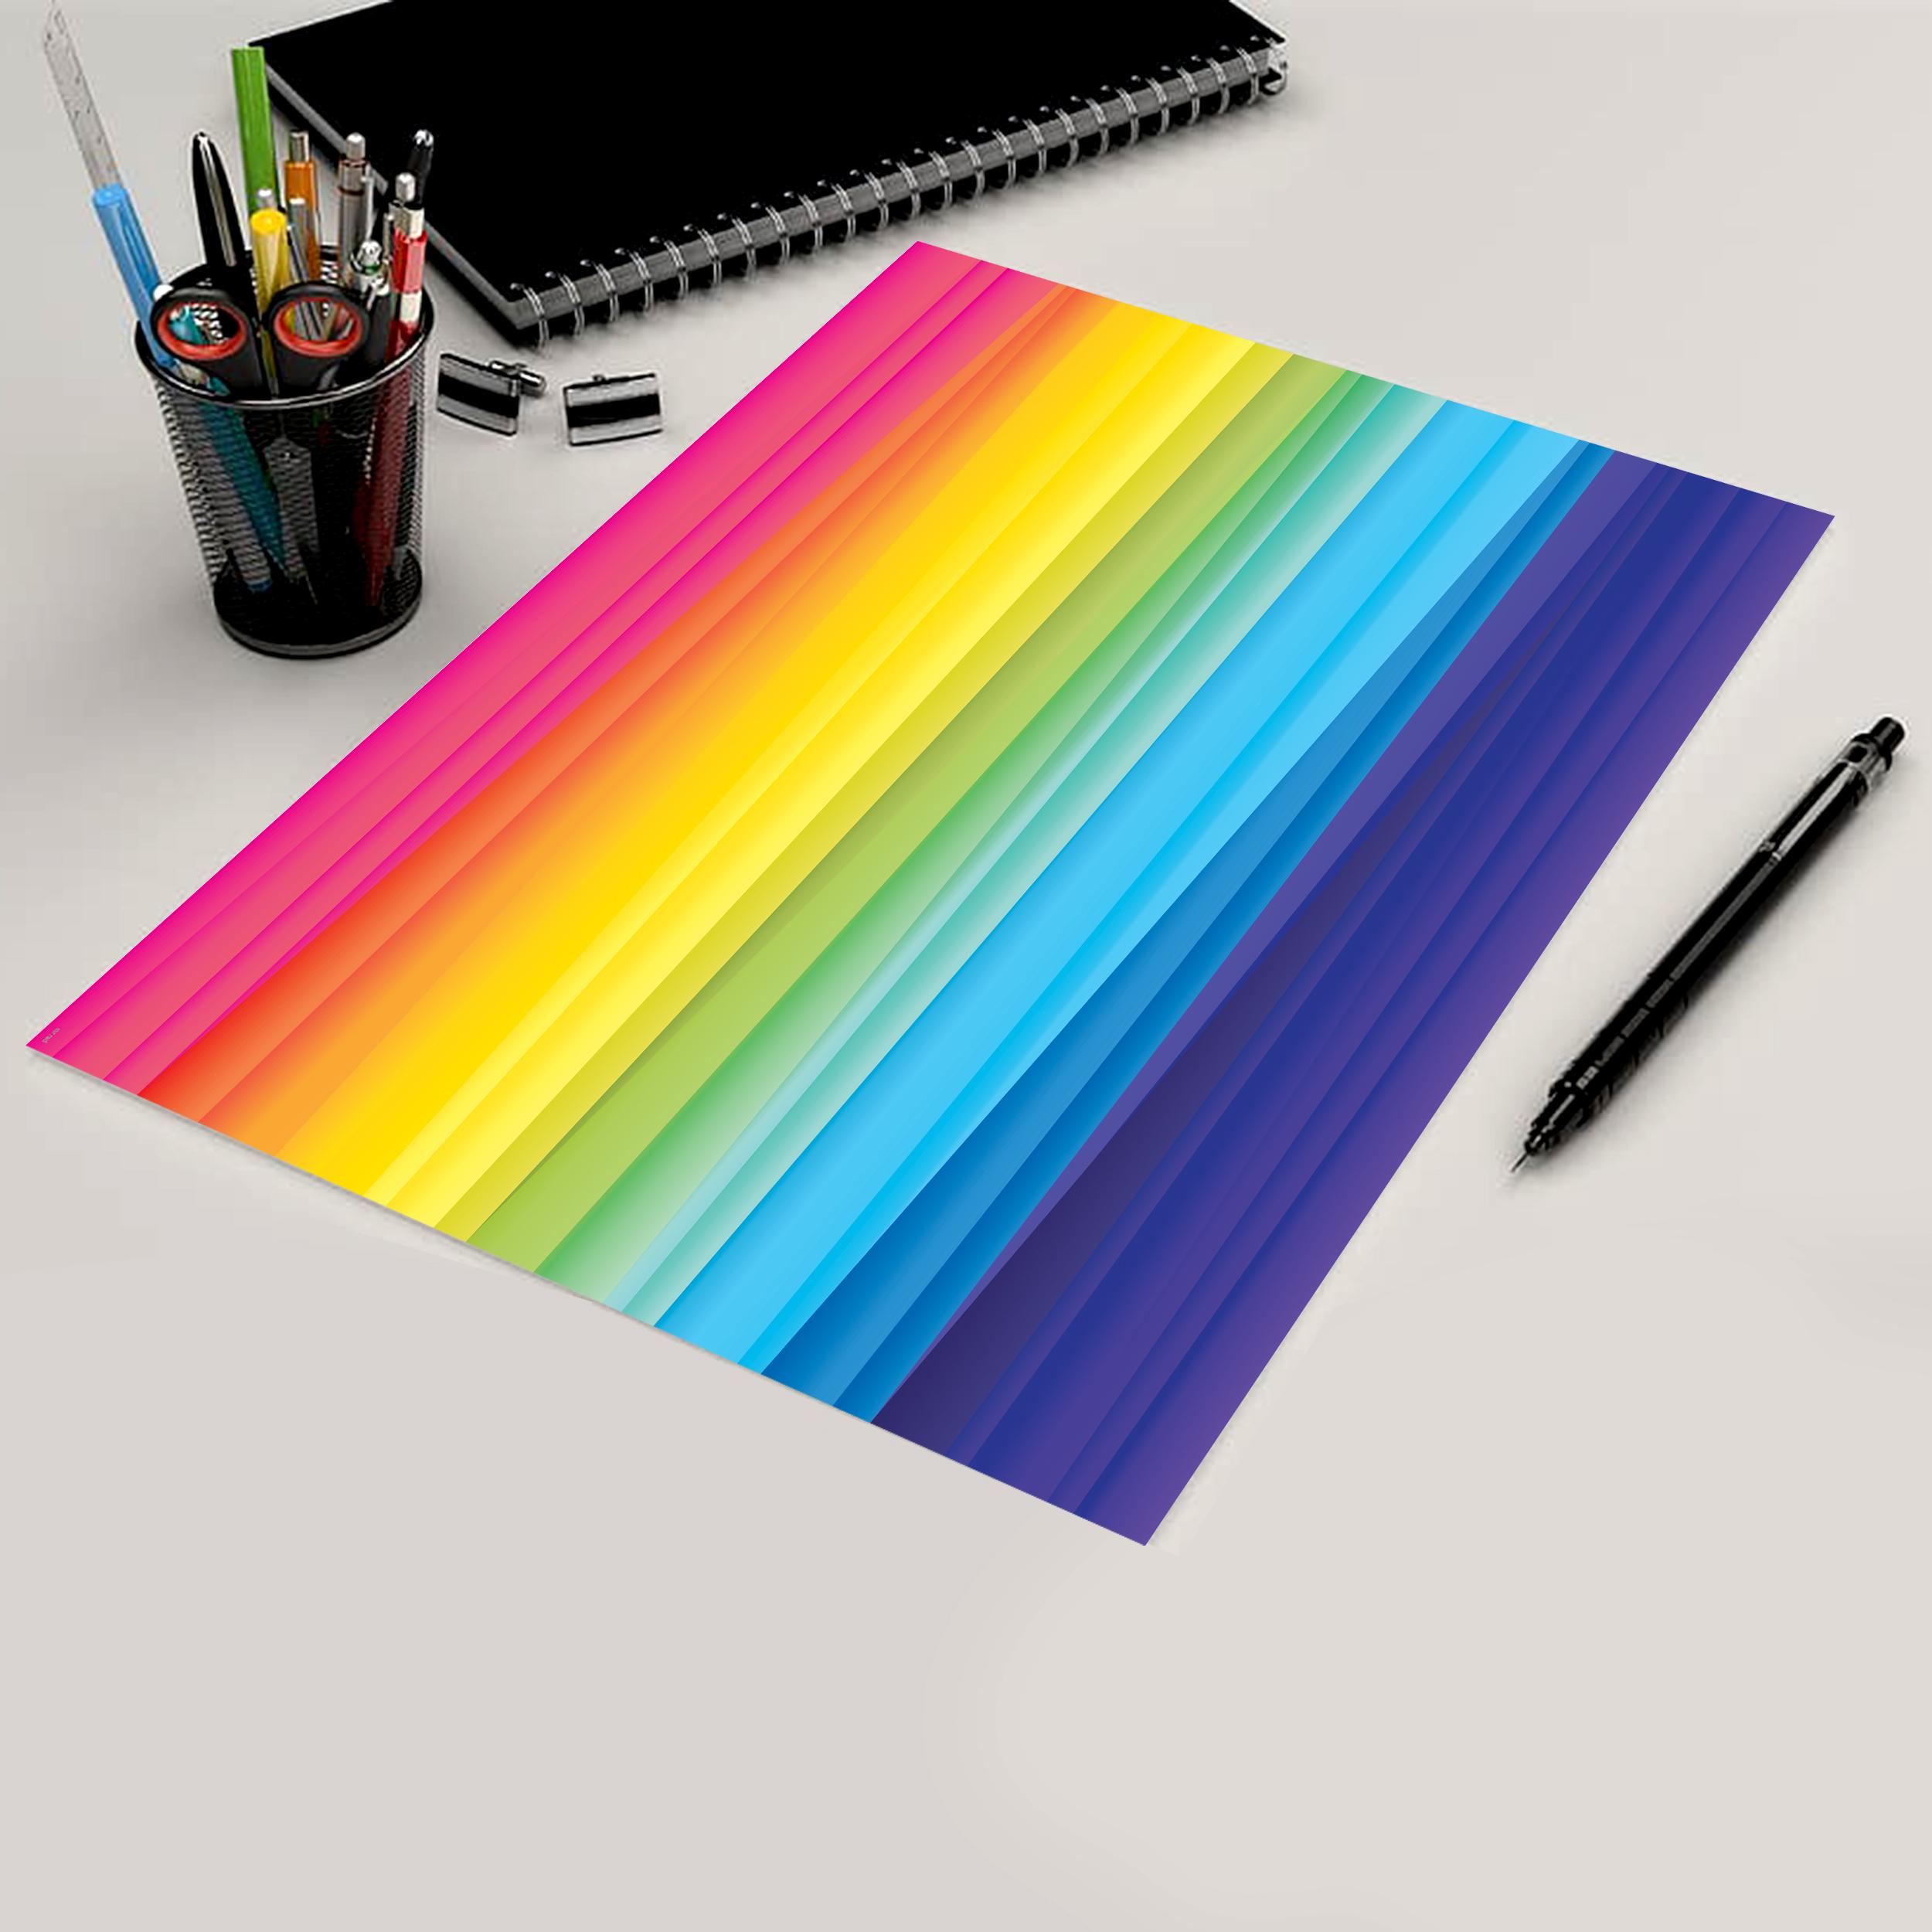 کاغذ رنگی A4 مستر راد مدل رنگارنگ بسته 10 عددی main 1 7